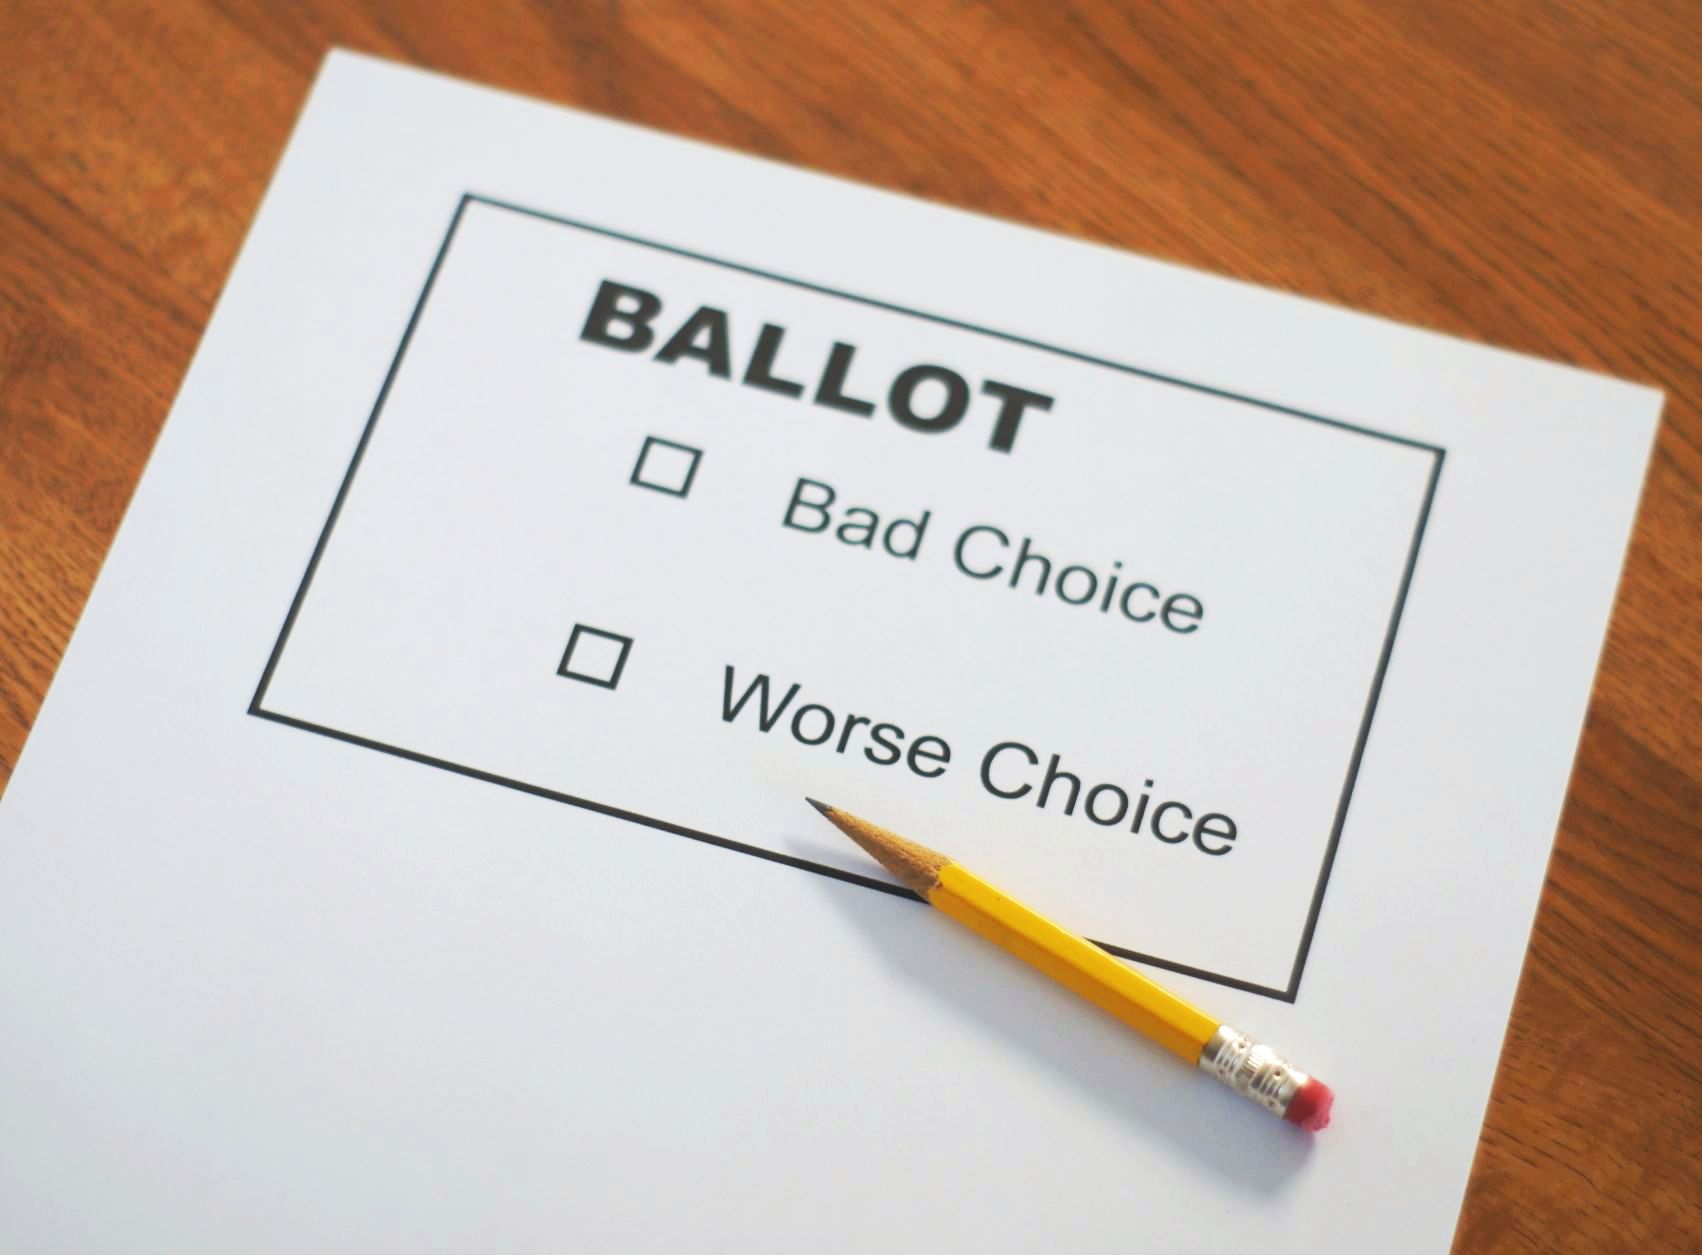 2016 Republican Presidential Primary Ballot